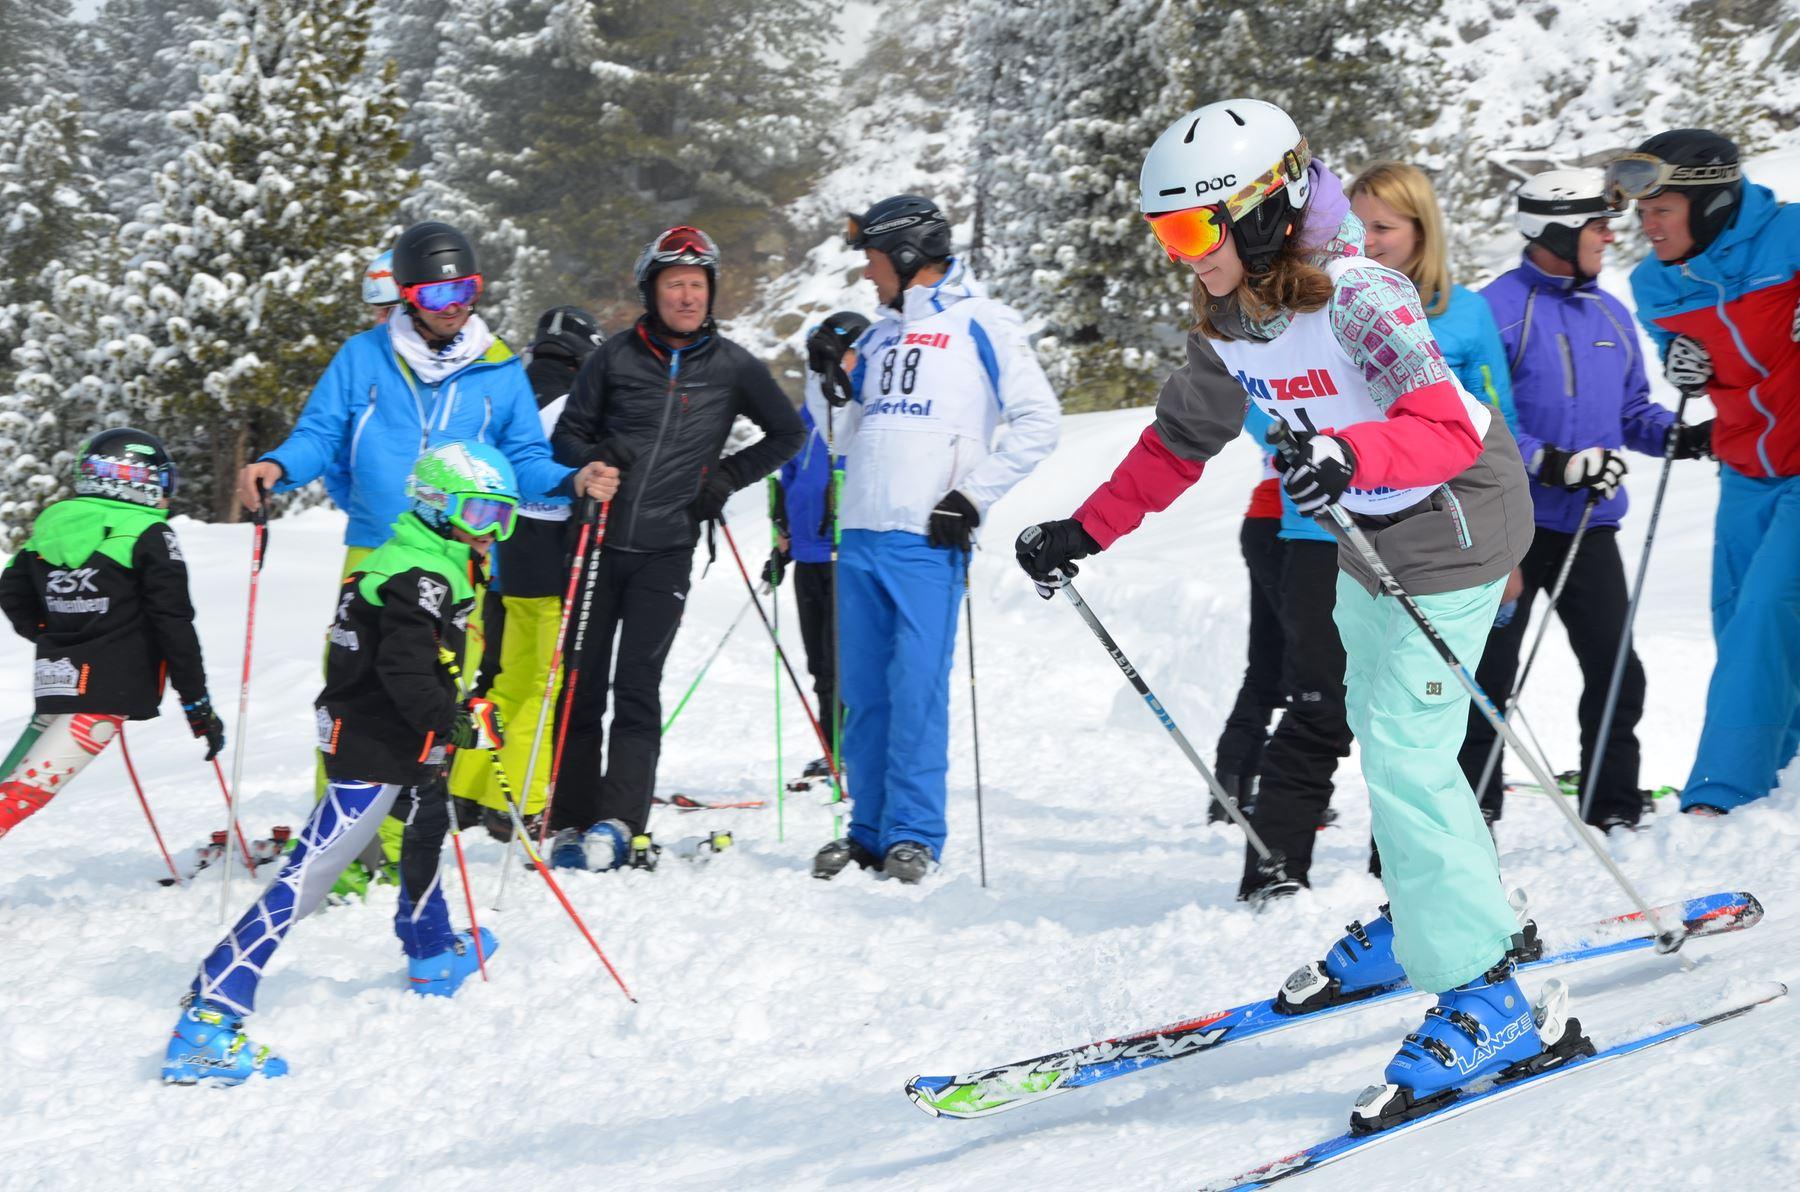 2015-03-22 BV Zillertal Skirennen 103.JPG